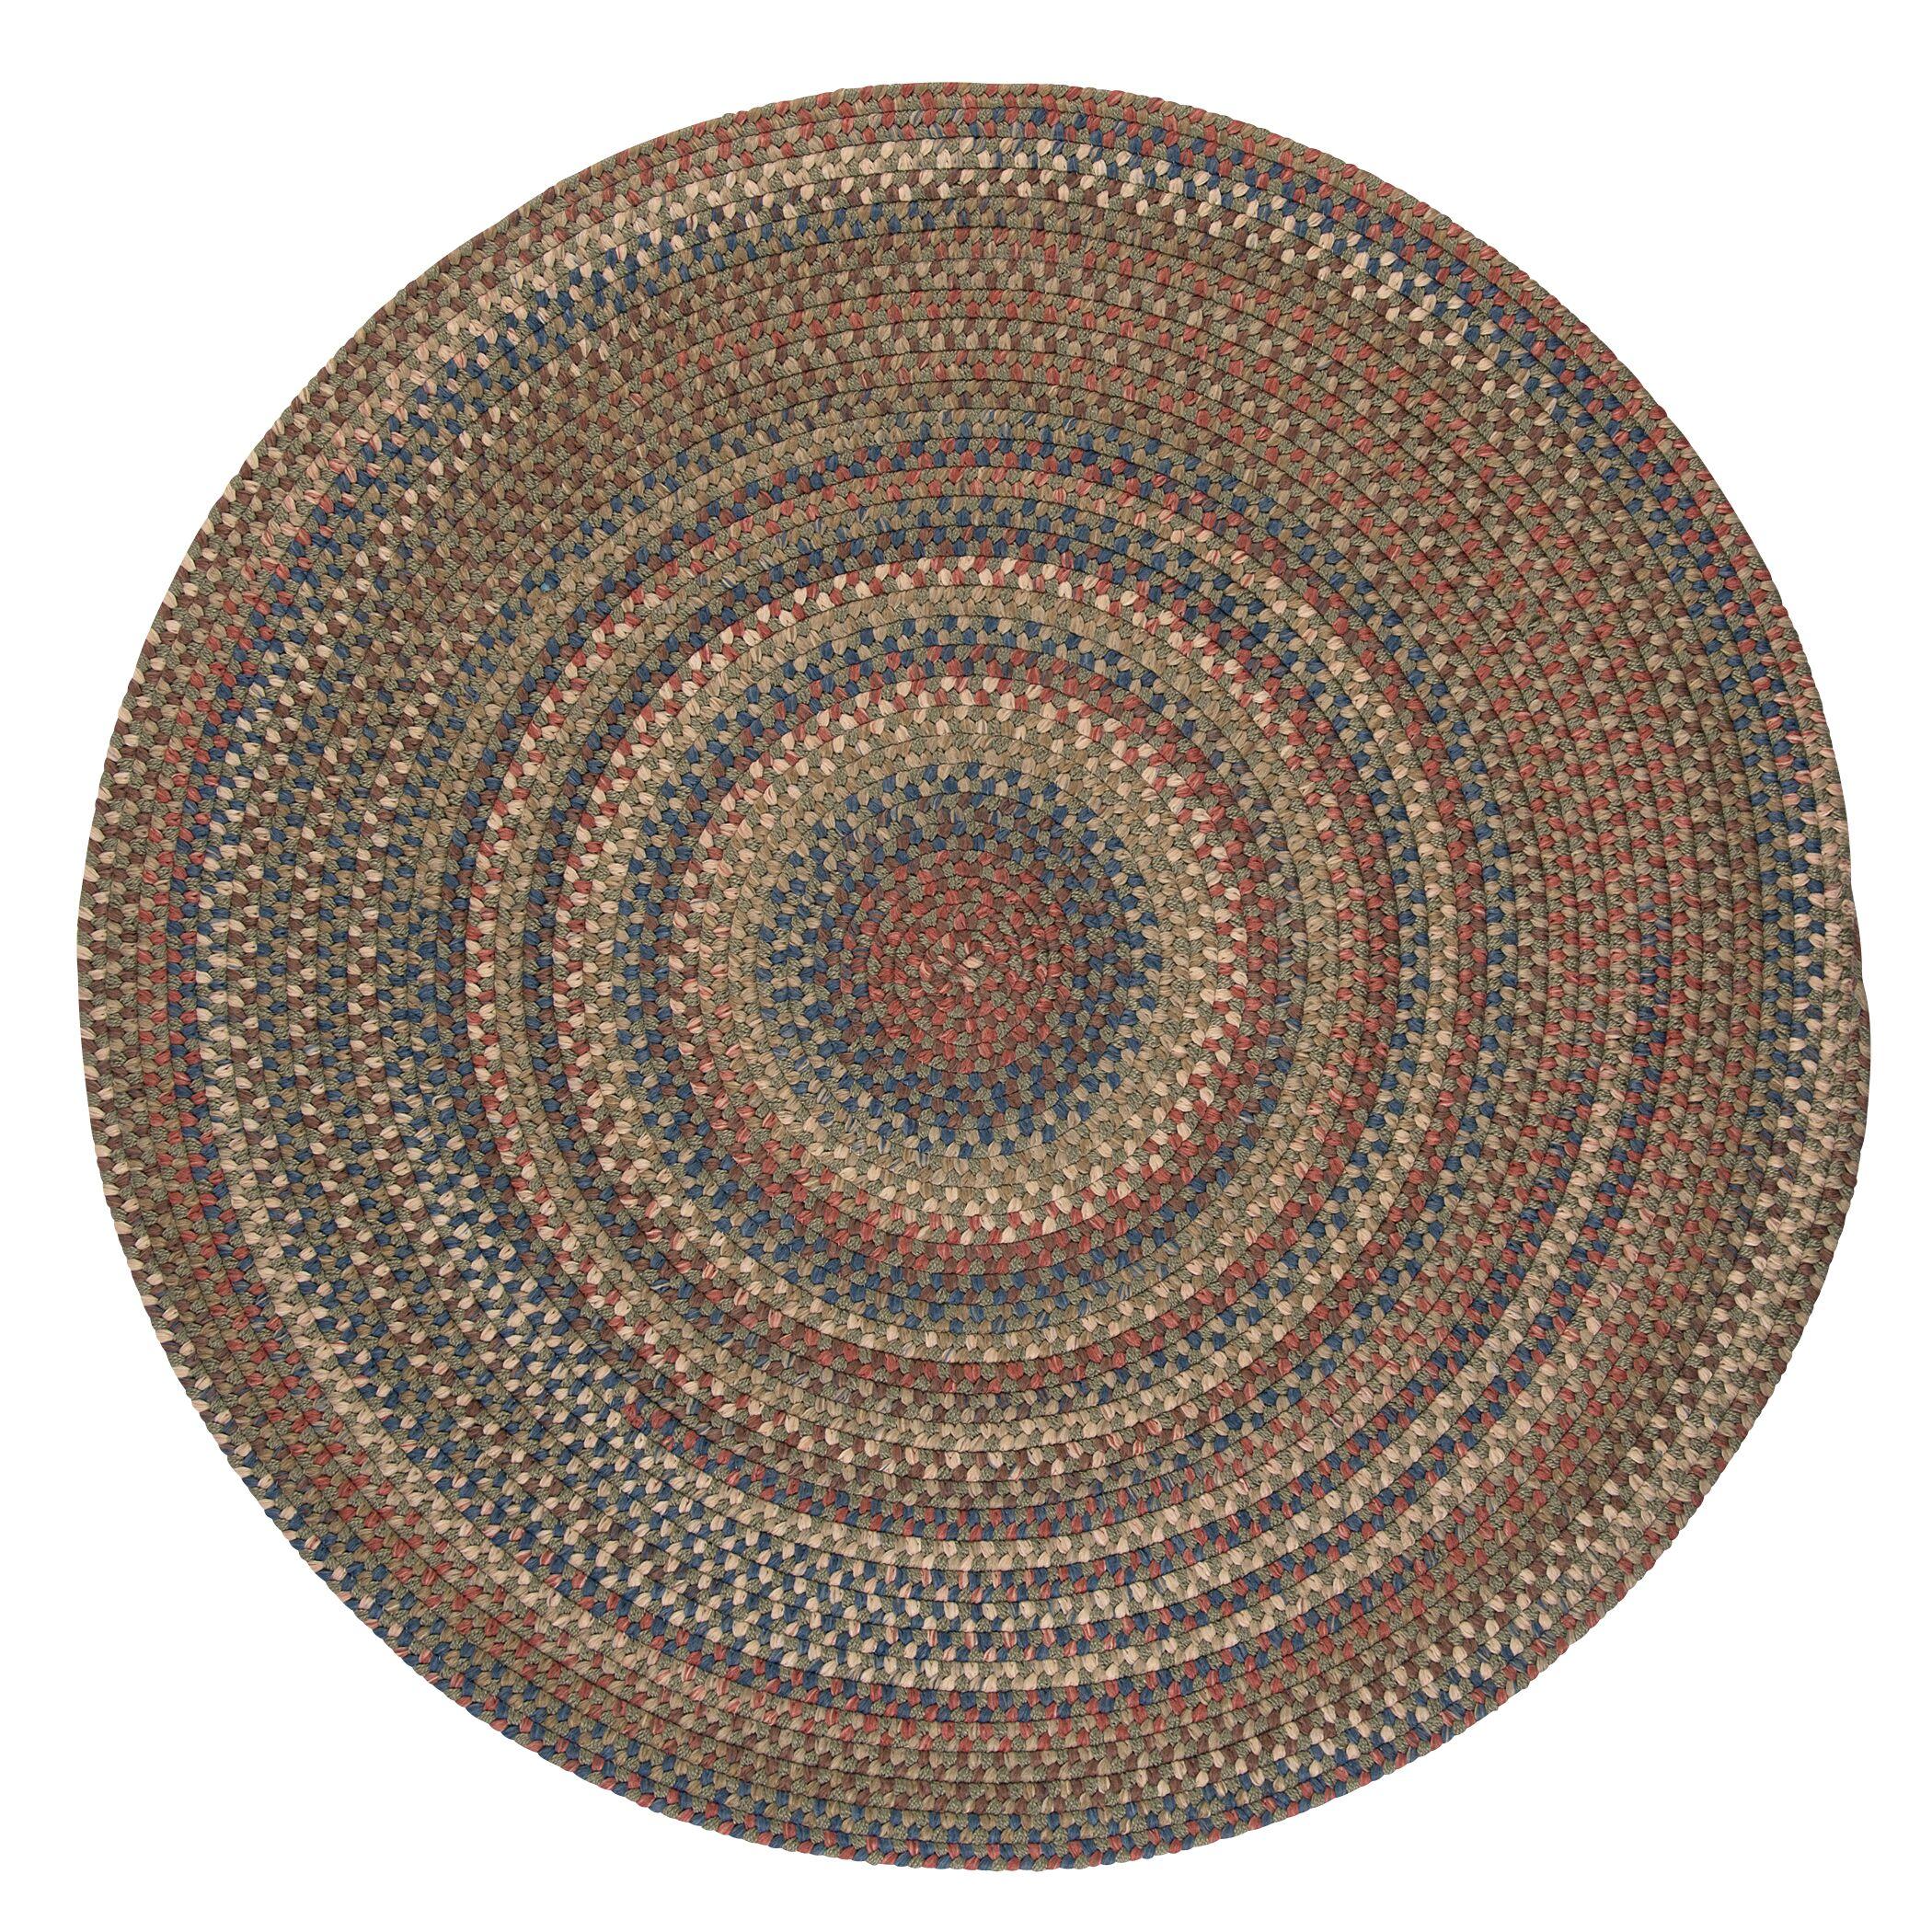 Kipton Olive Area Rug Rug Size: Round 8'